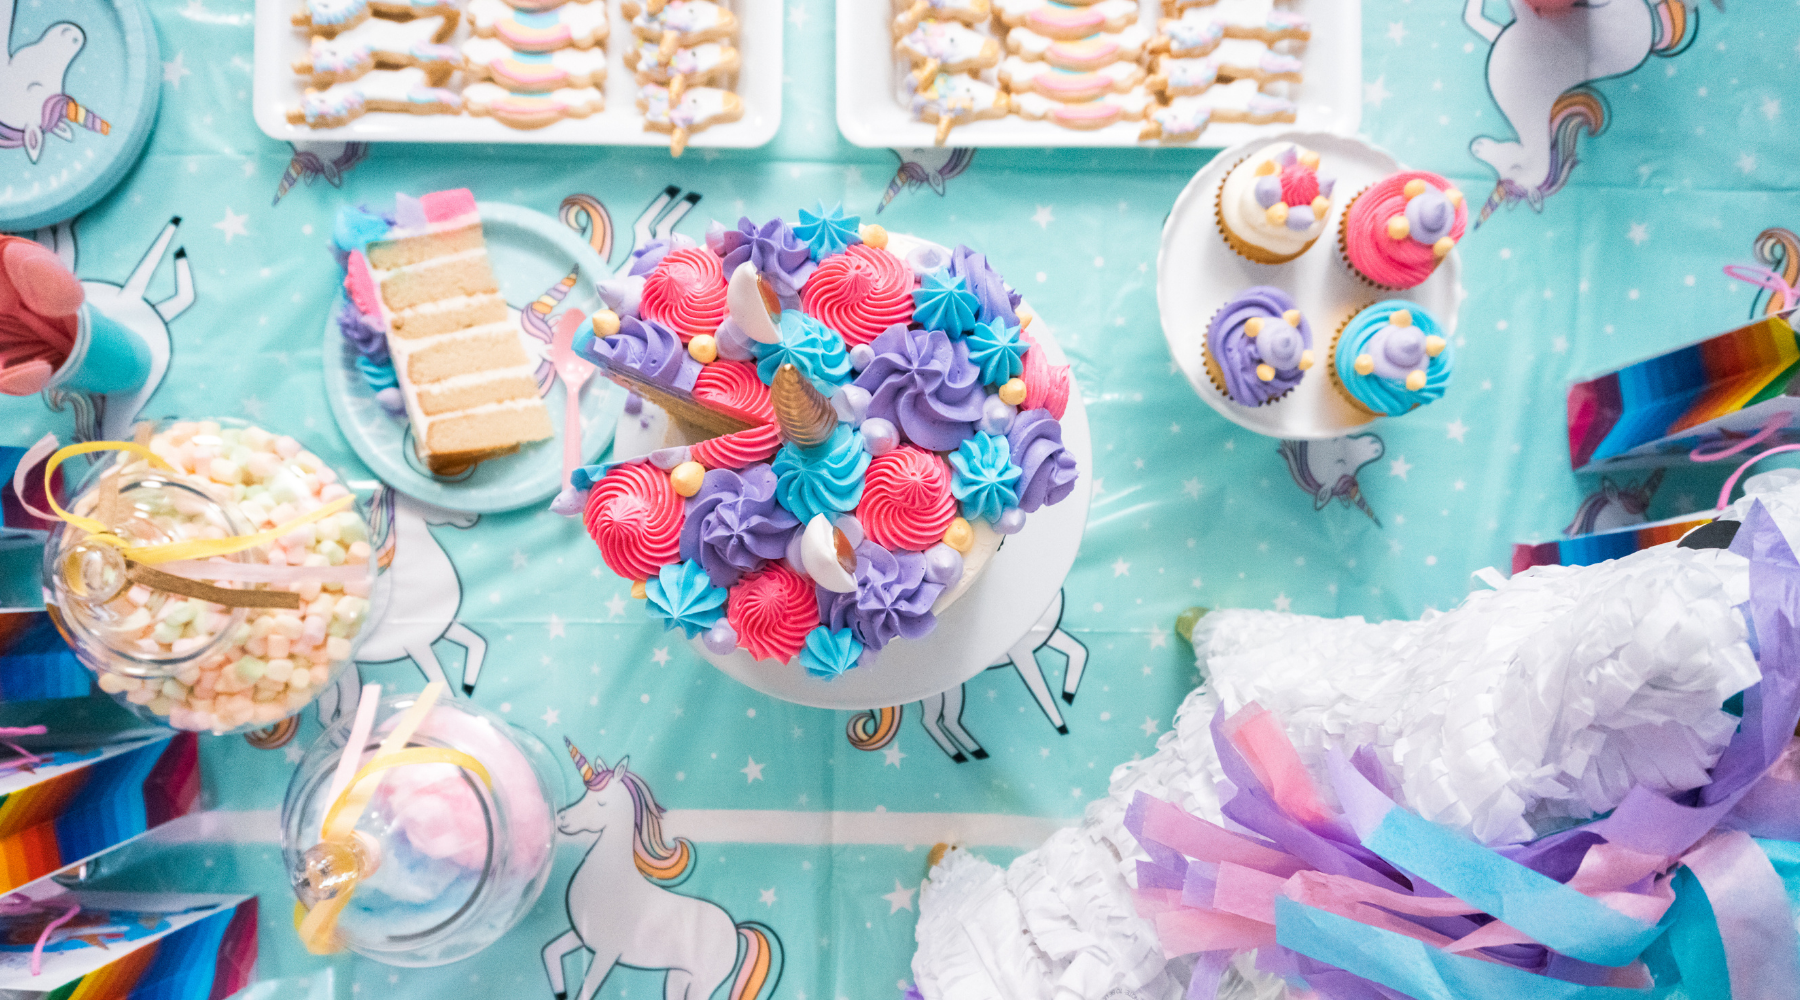 Unicorn-themed tablescape